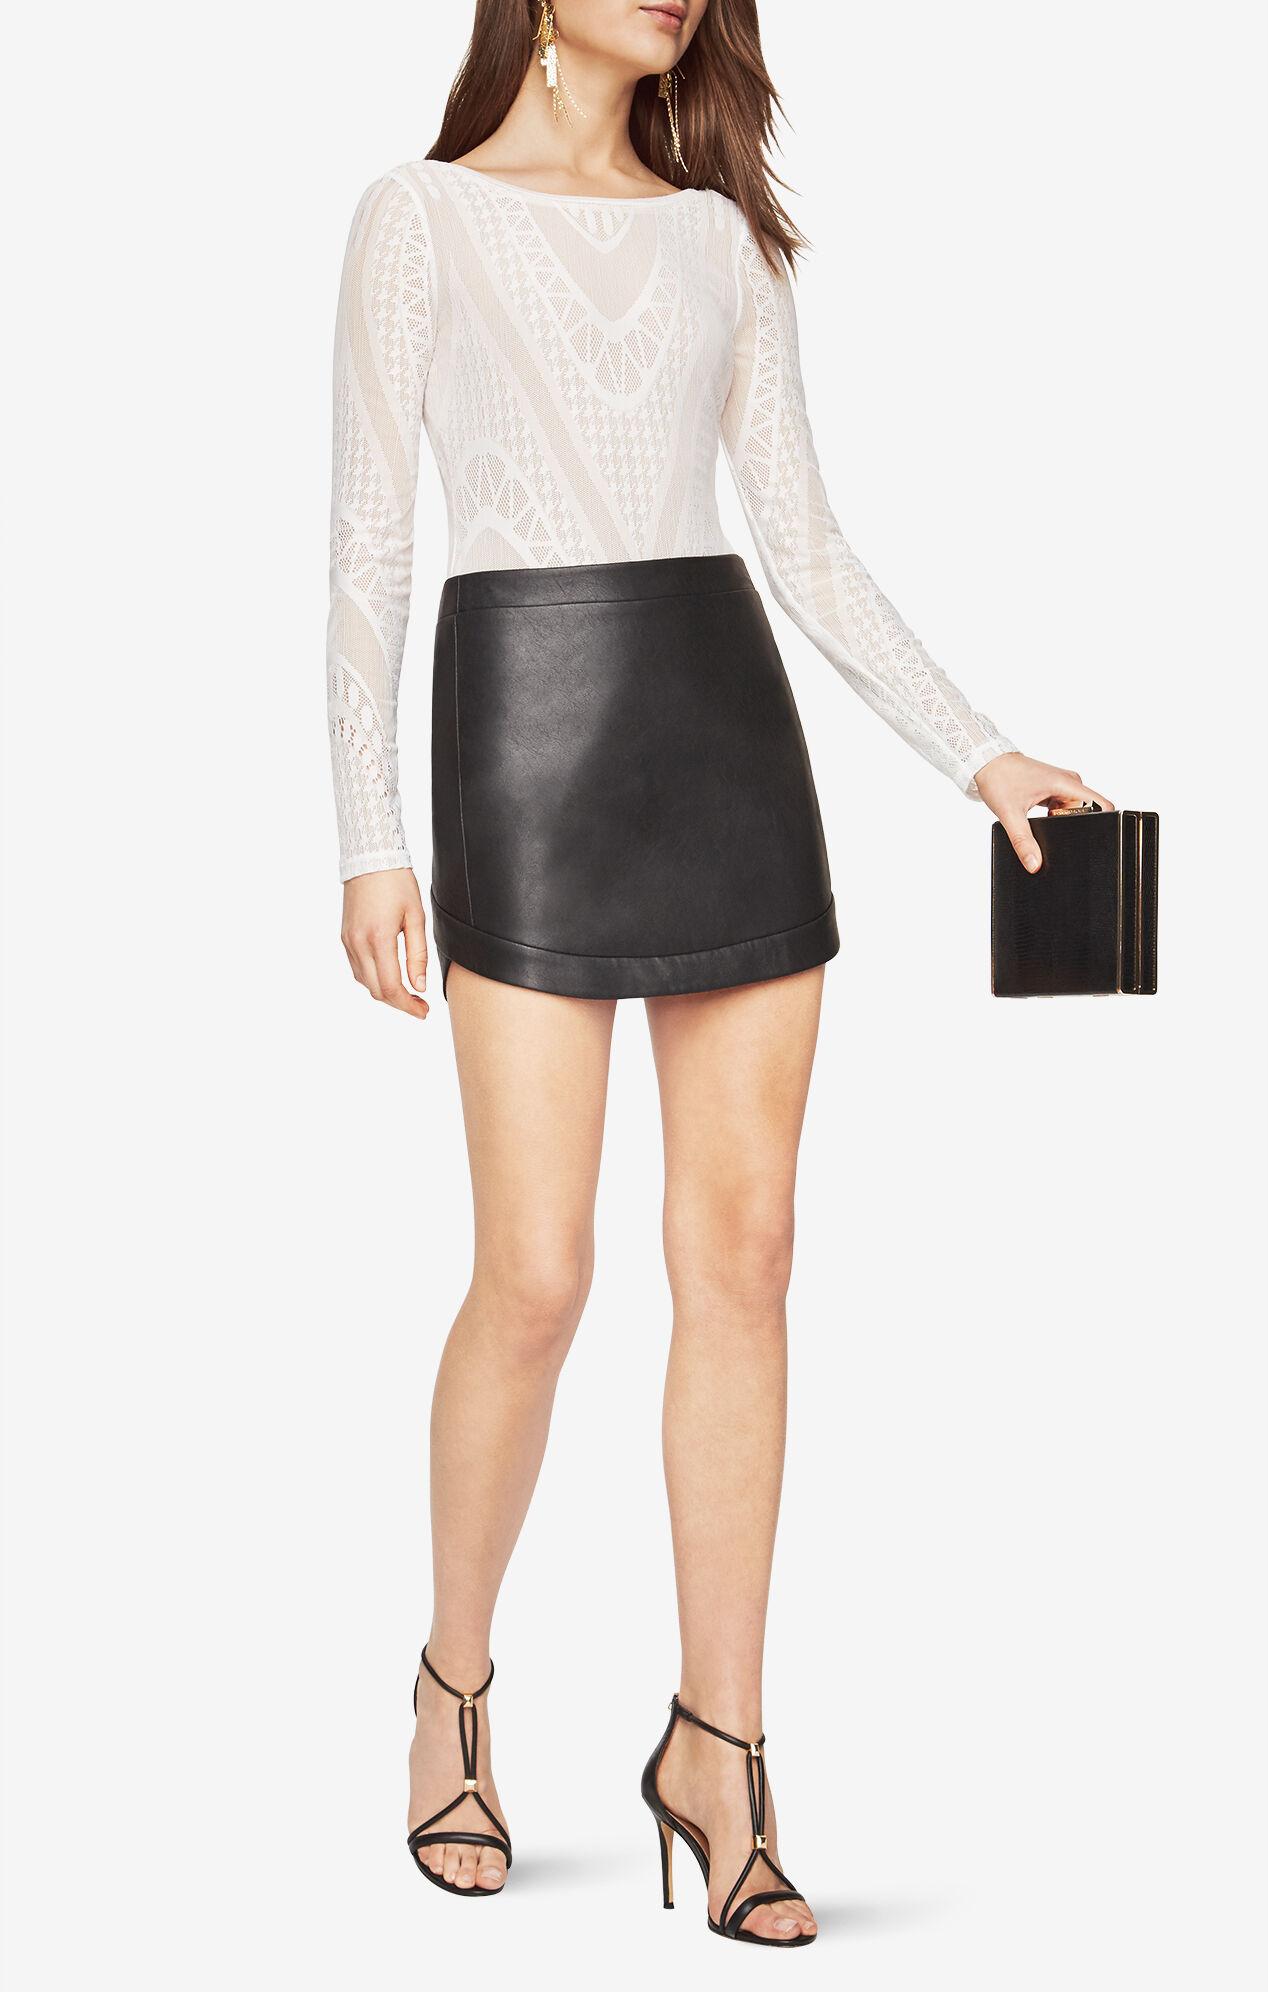 Kara Lace Bodysuit